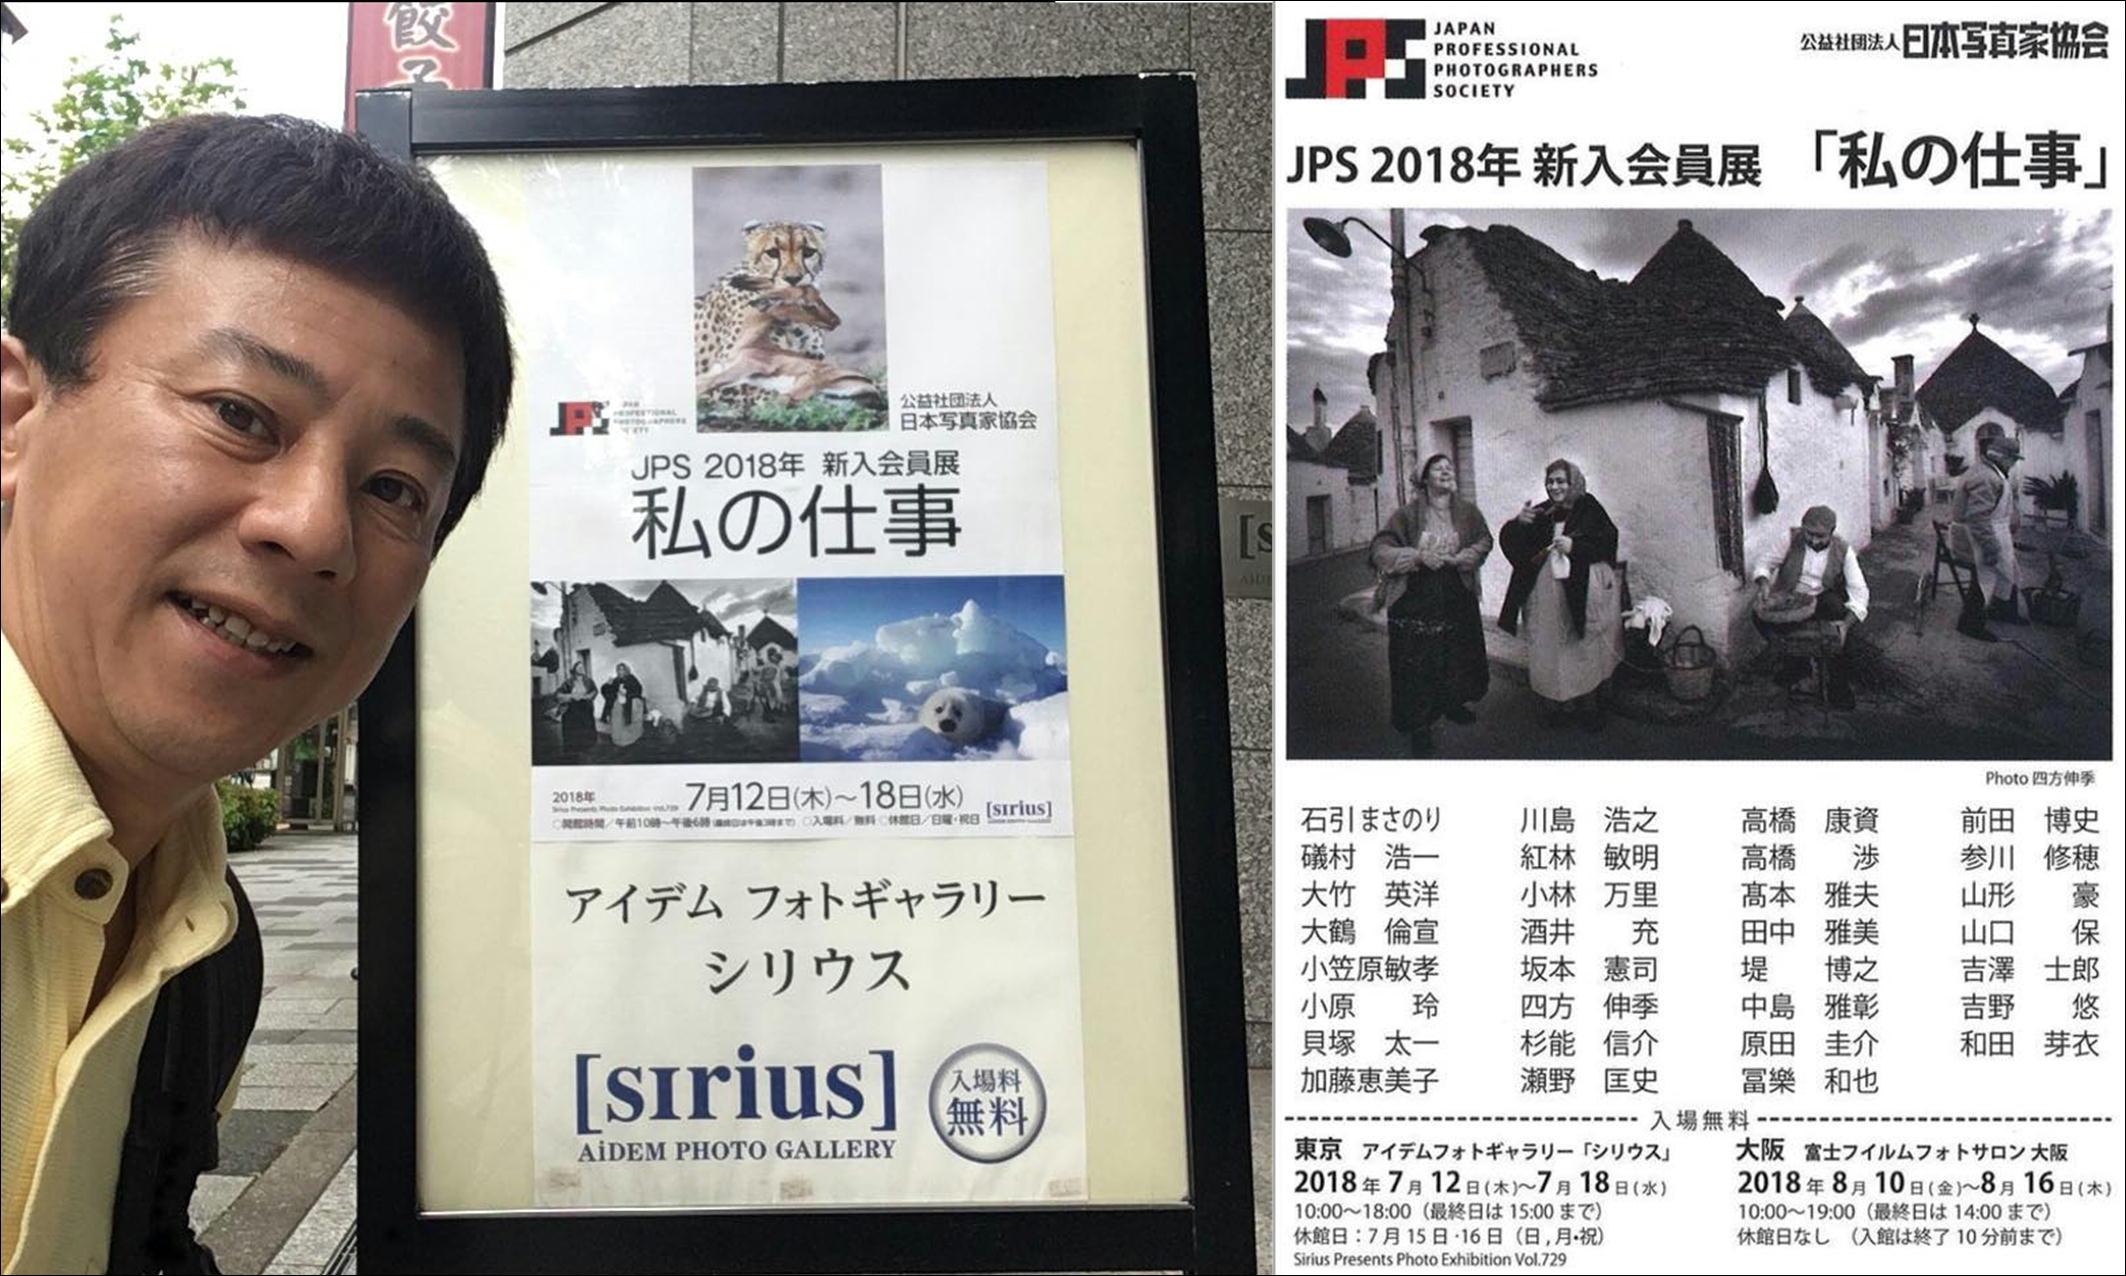 JPS新入会員展で吉ヶ原の写真を展示